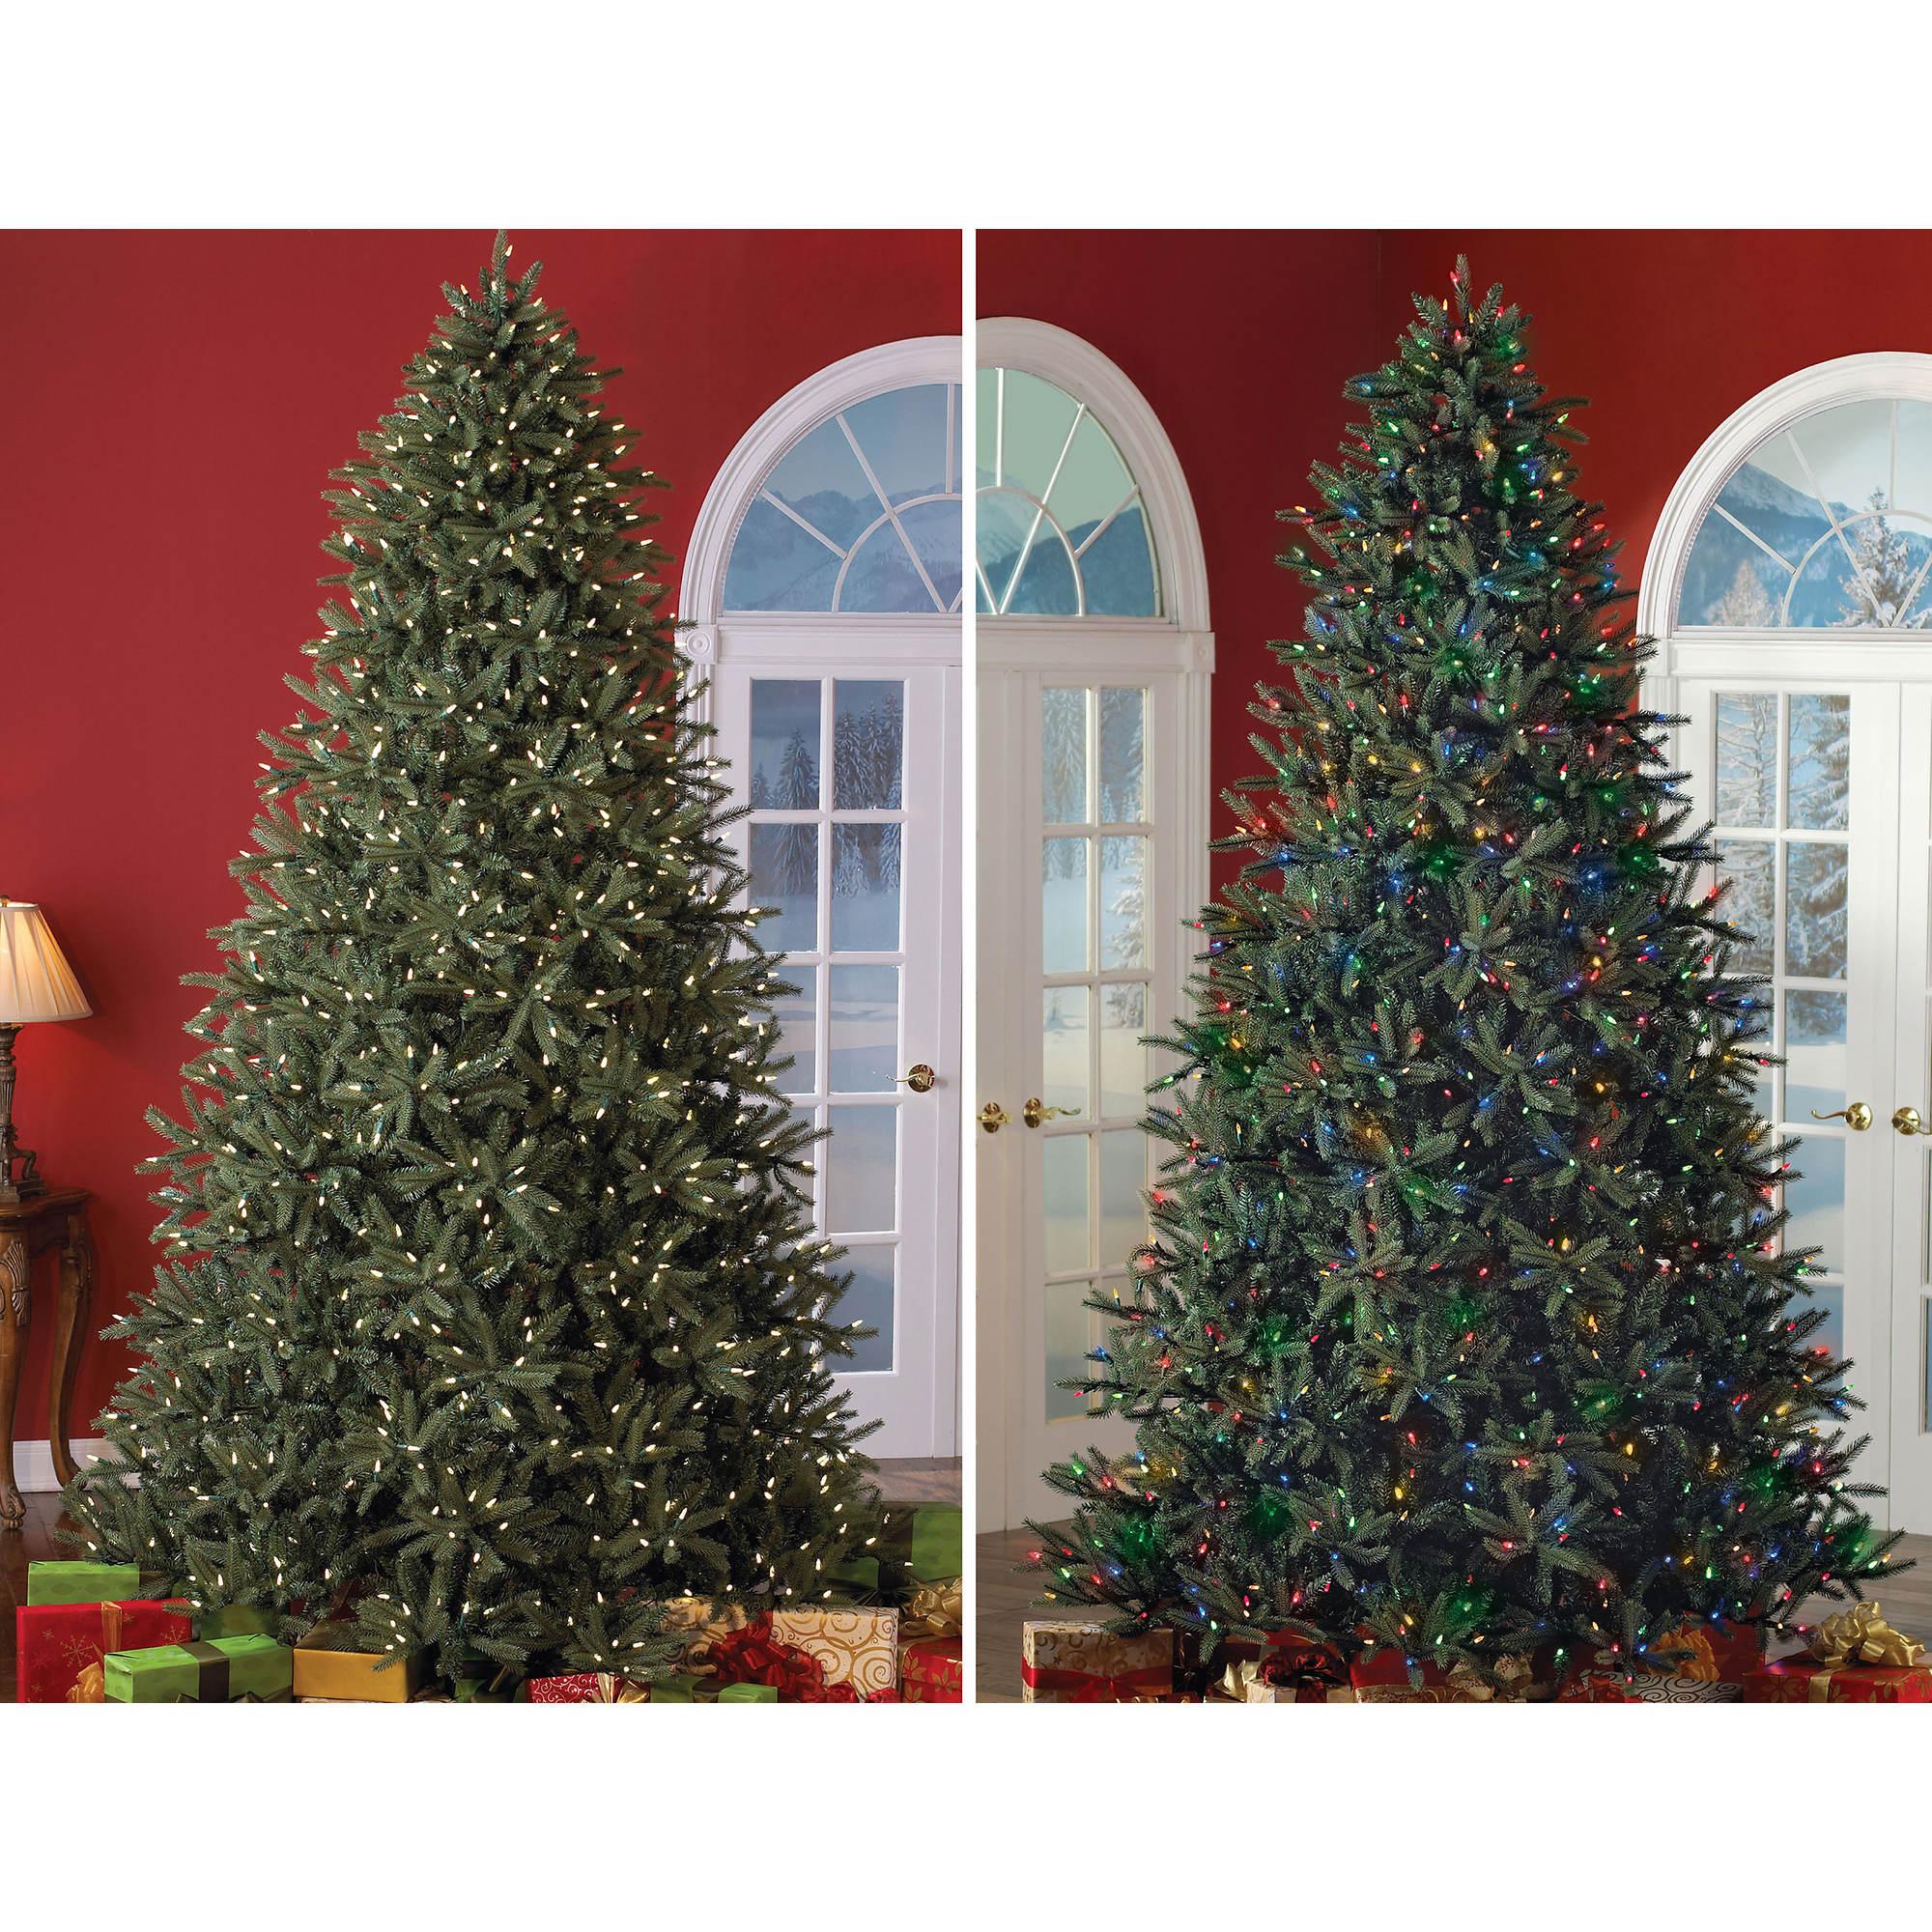 Artificial & Pre-Lit Christmas Trees - BJ's Wholesale Club